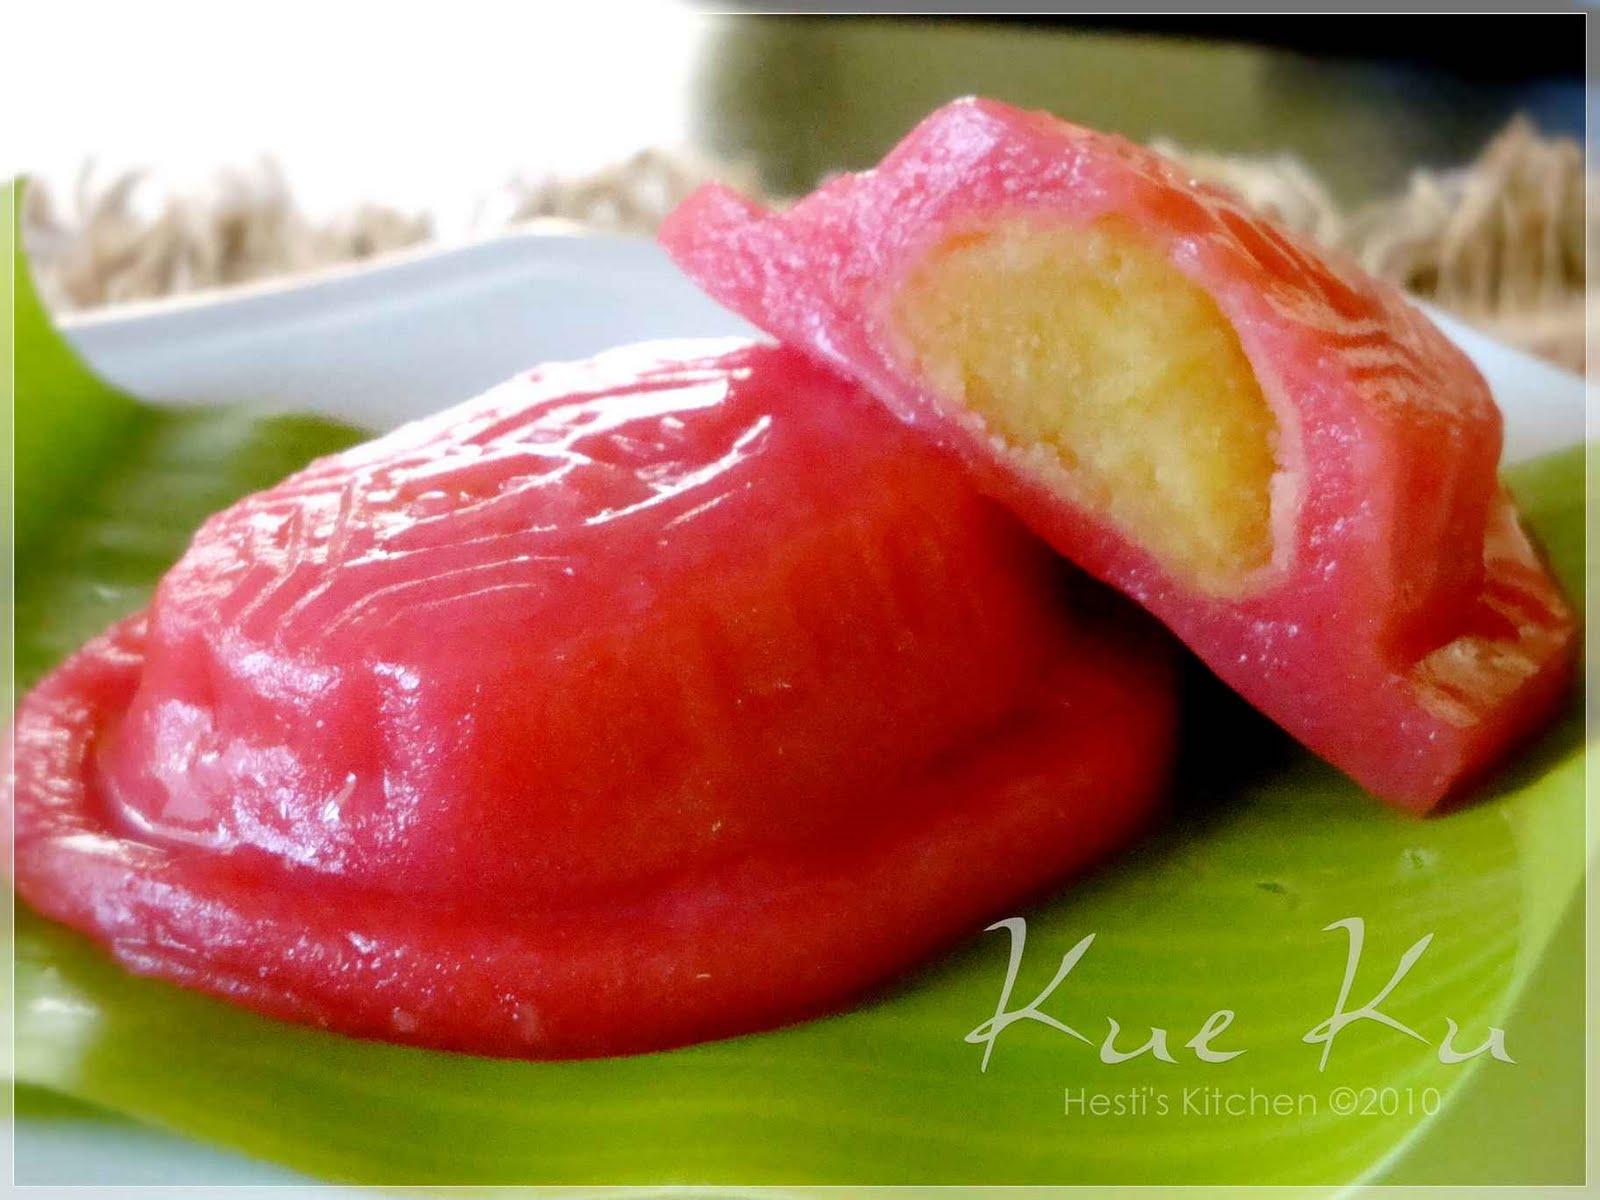 Resep Cake Kukus Hesti Kitchen: HESTI'S KITCHEN : Yummy For Your Tummy: Kue Ku